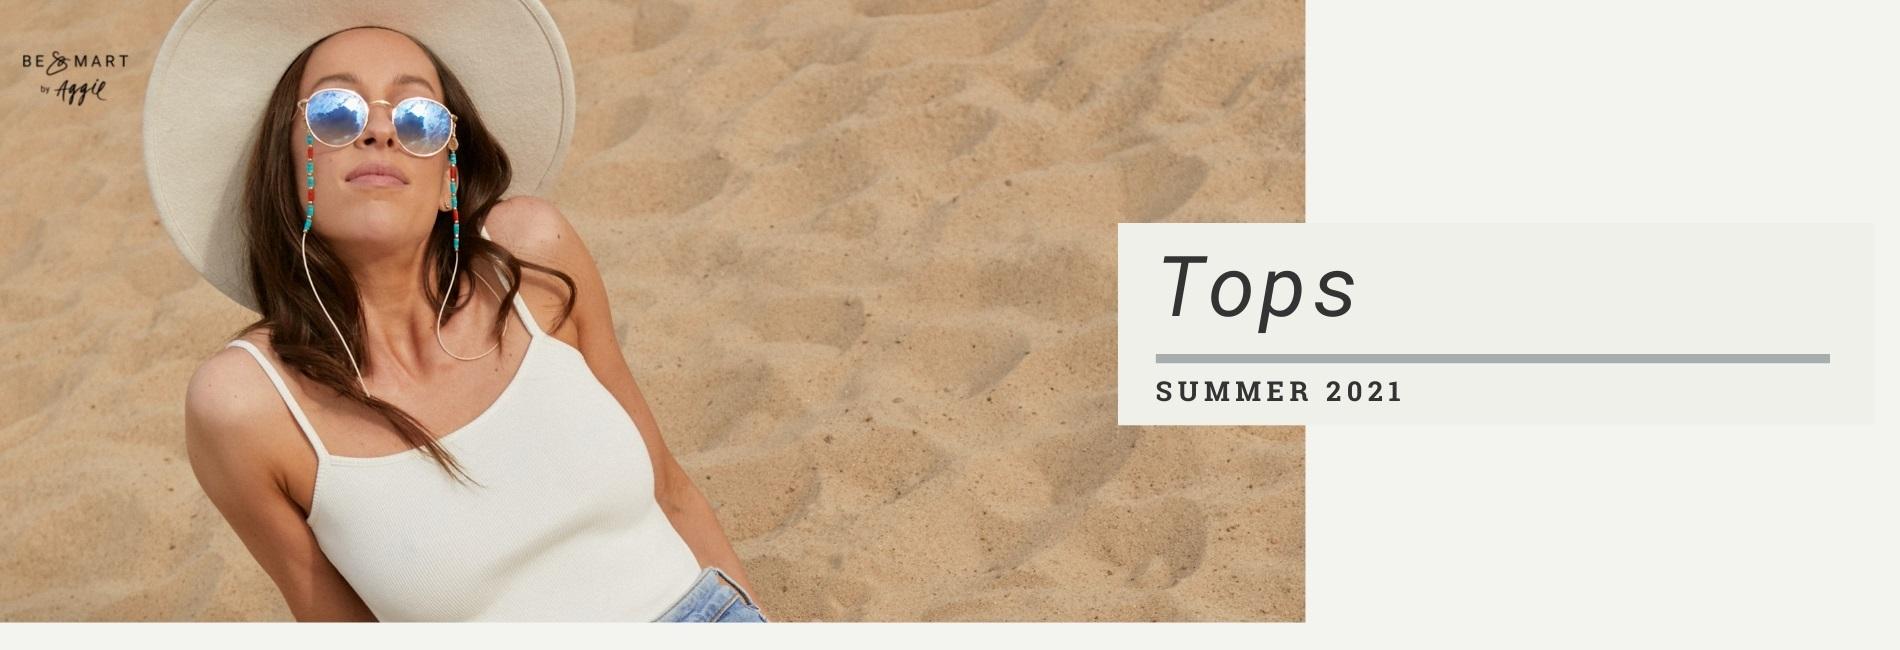 Tops - Summer 2021